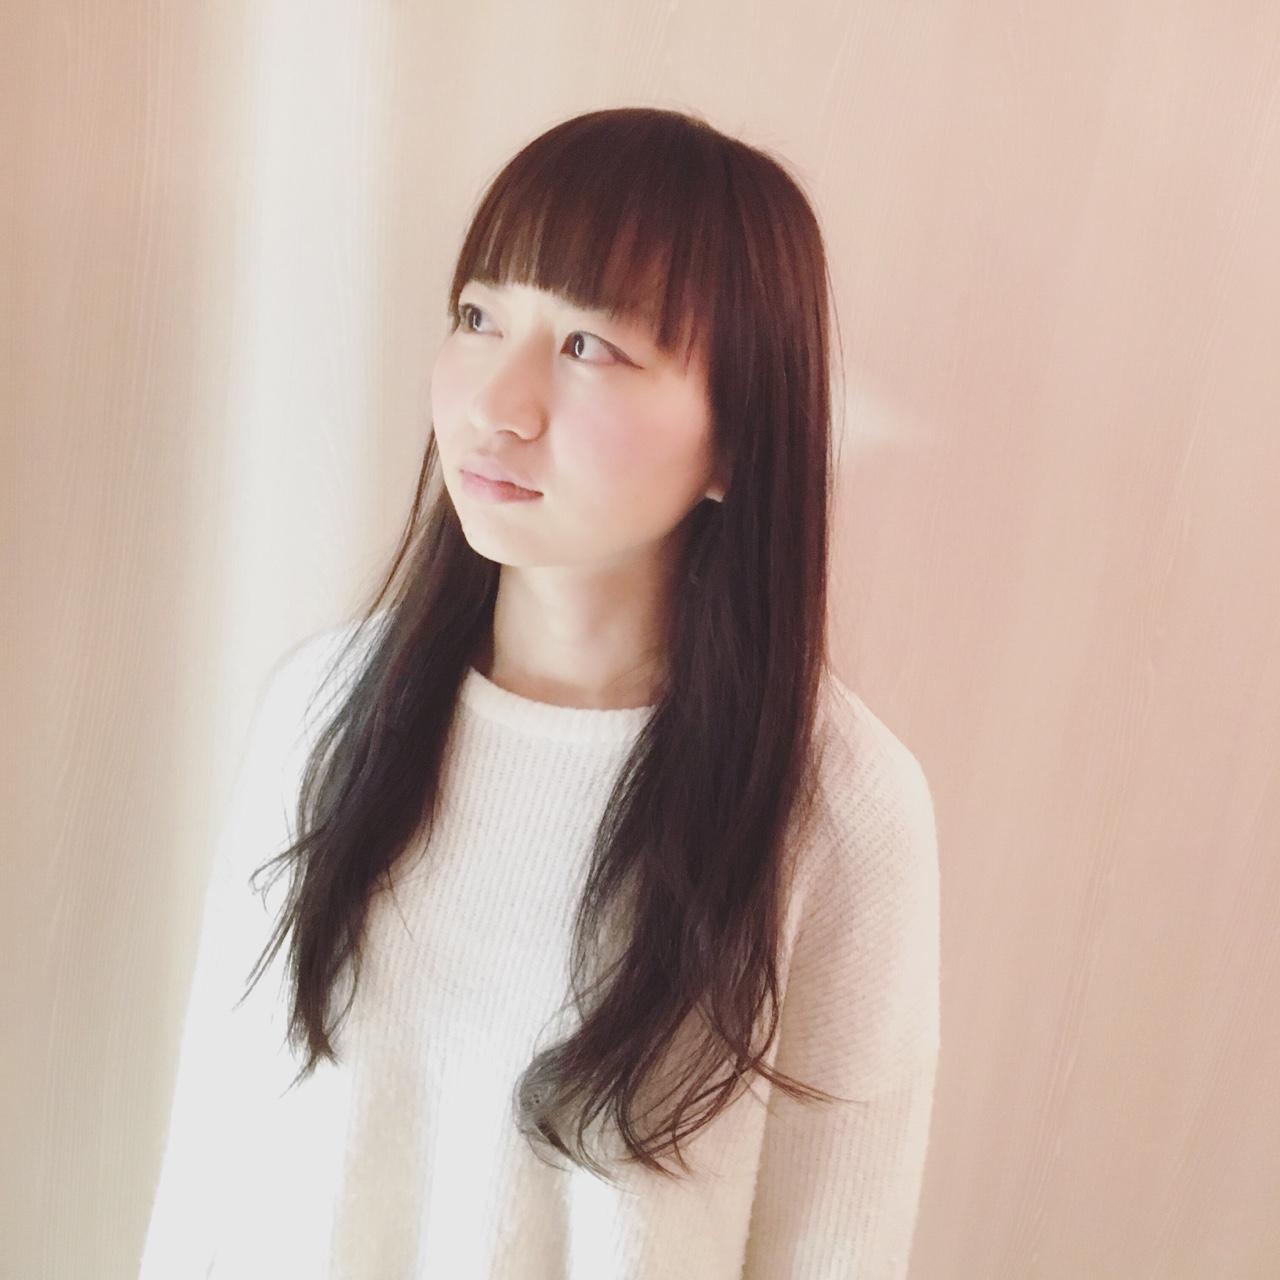 New post from Uchida